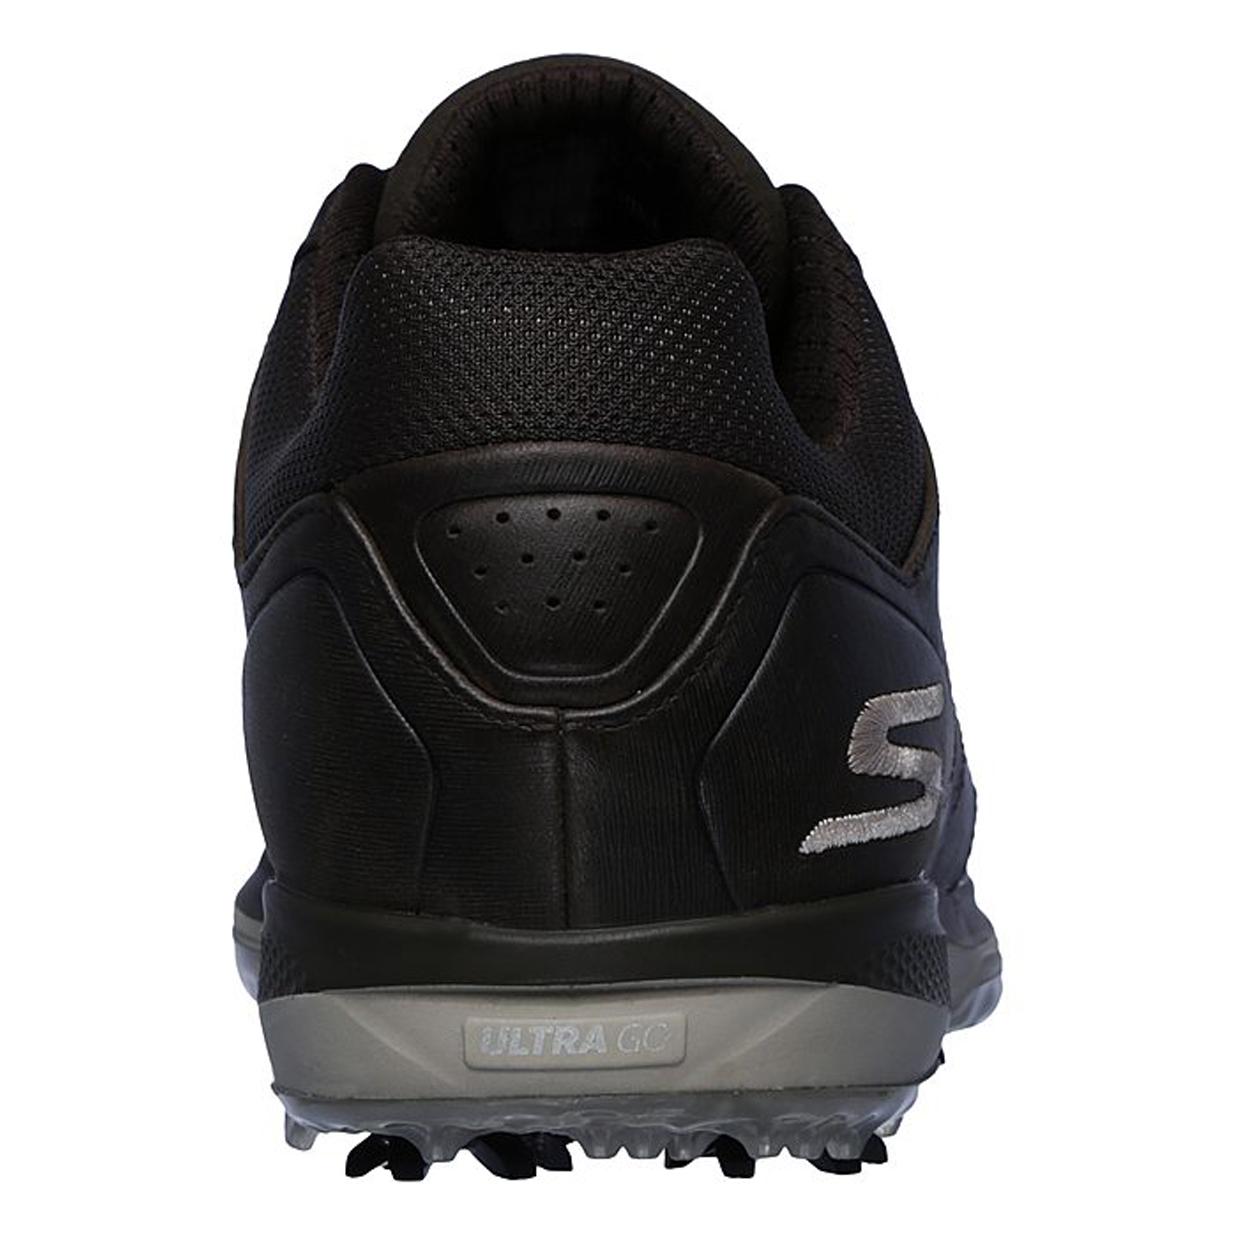 Skechers-Men-039-s-GOgolf-Pro-4-LX-Leather-Golf-Shoe-Brand-New thumbnail 14